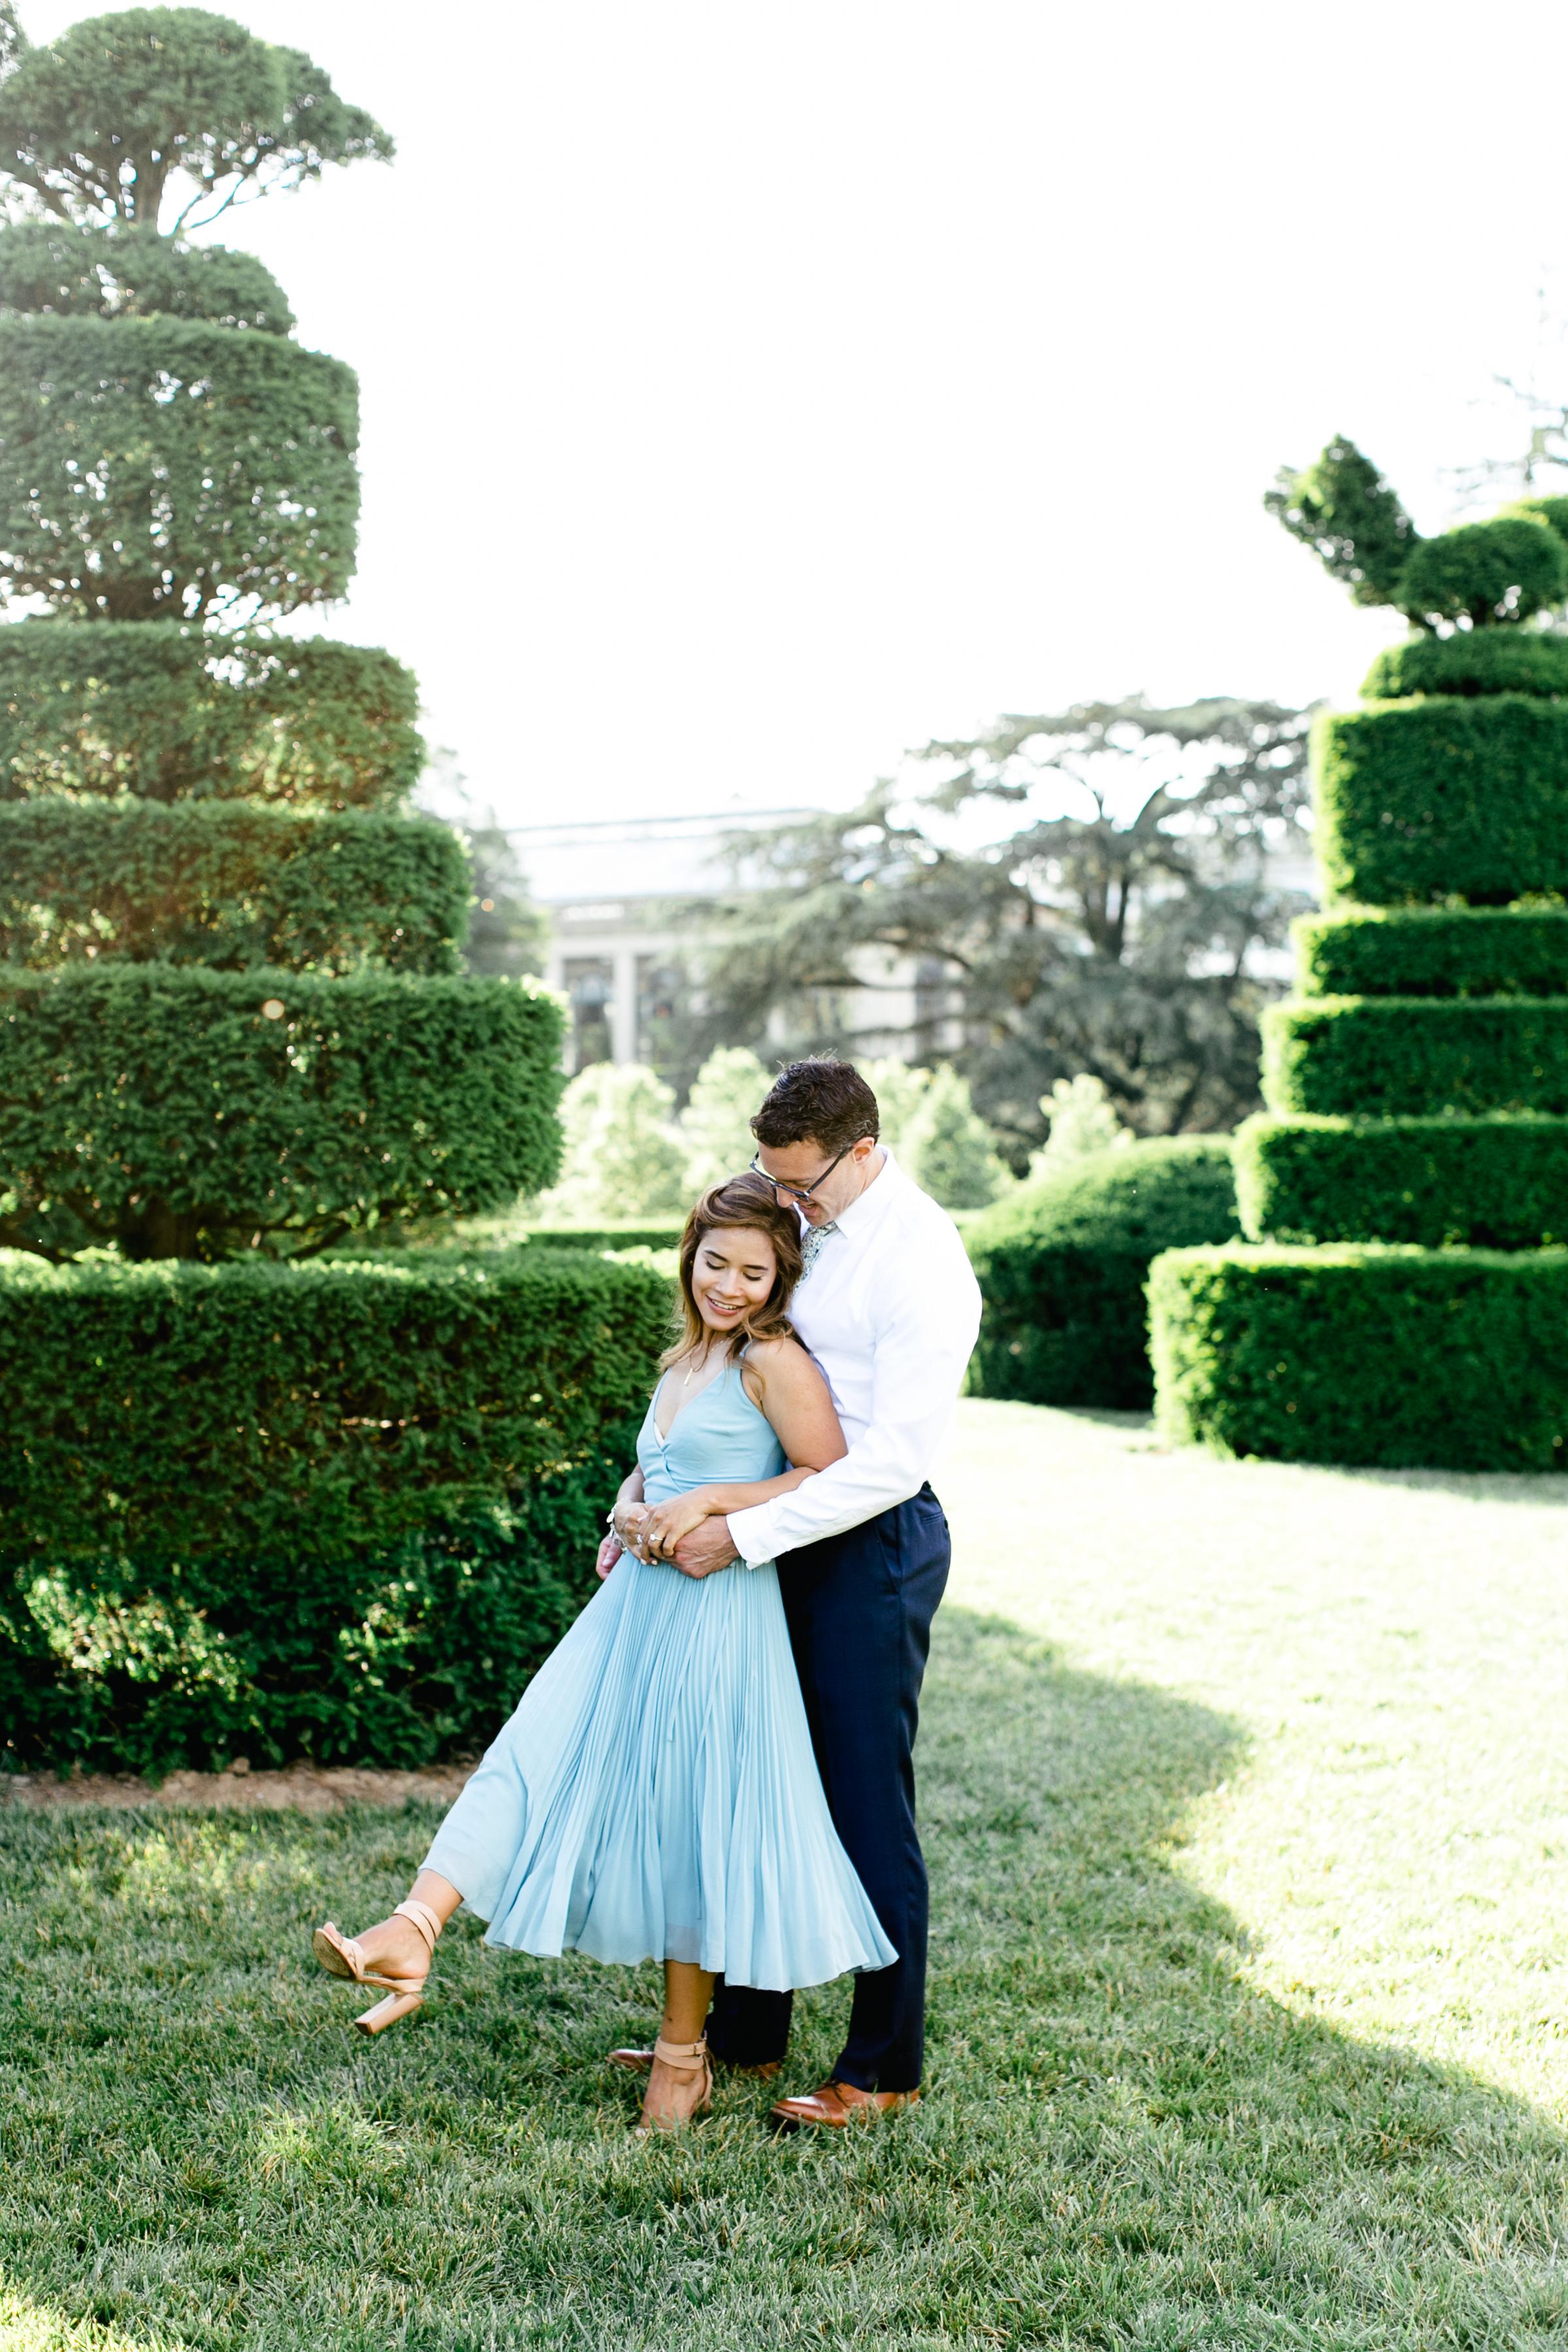 photography-natural-candid-engaged-proposal-philadelphia-wedding-longwood gardends-nature-flowers-modern-lifestyle-19.JPG